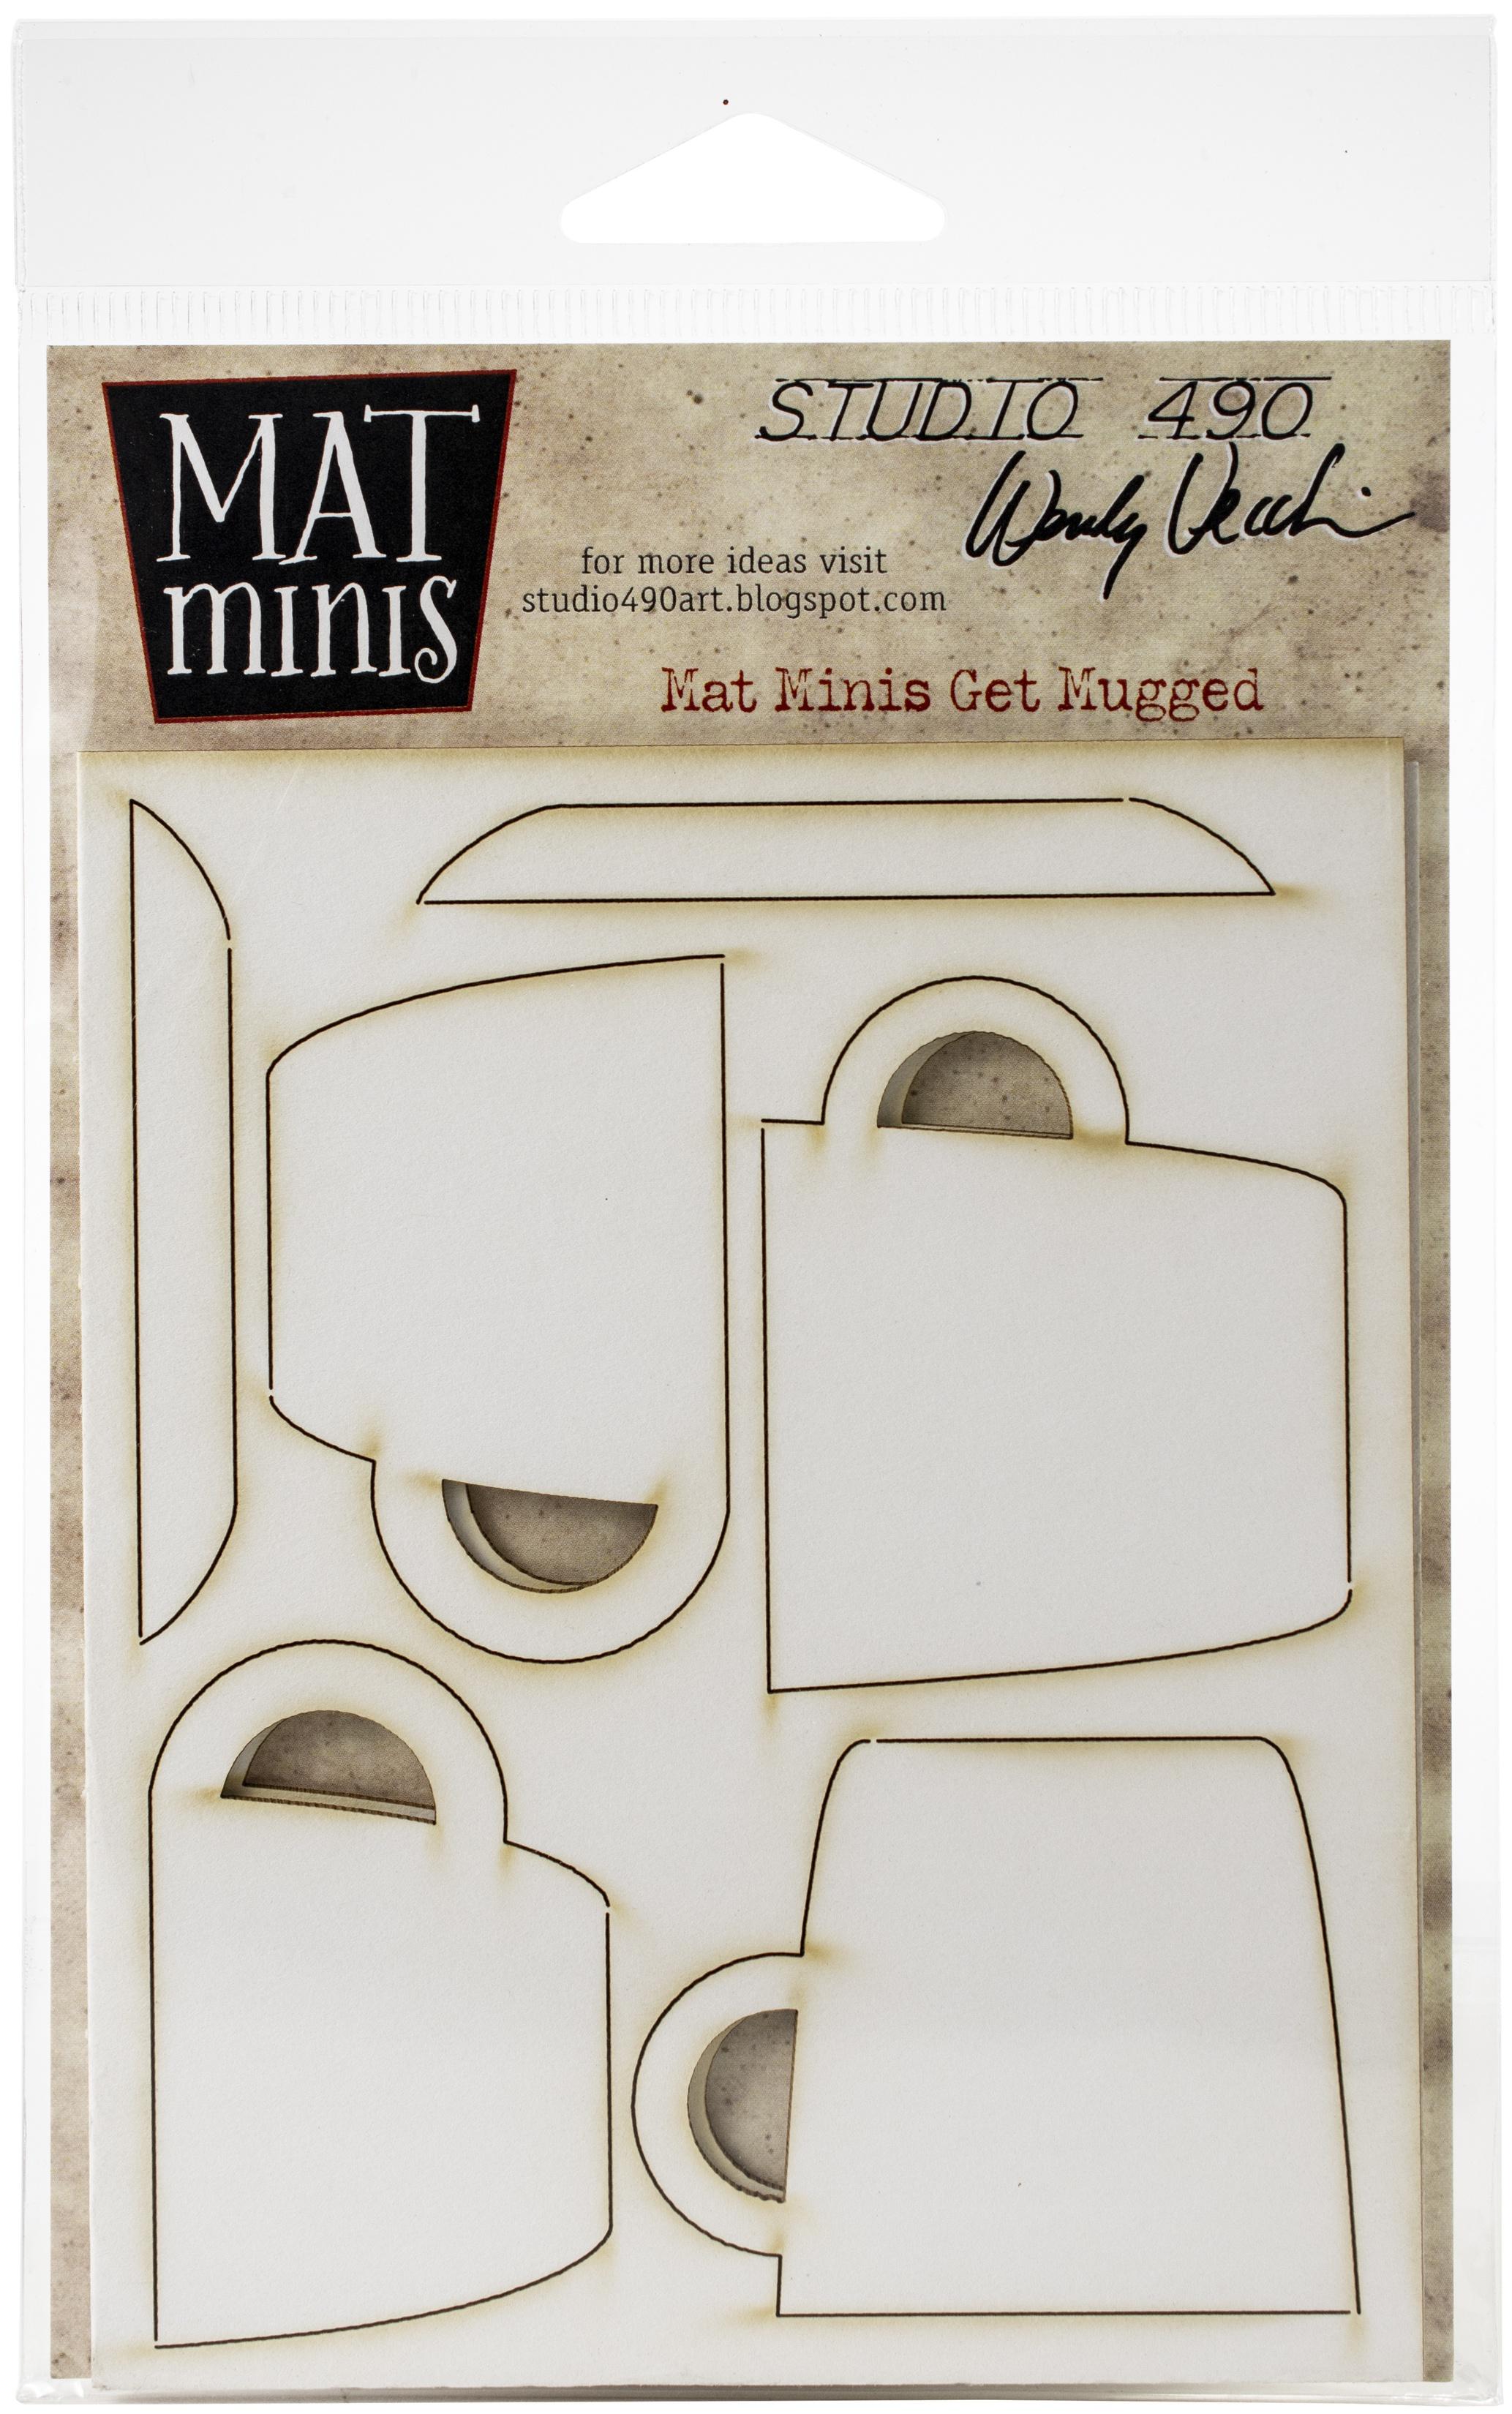 Studio 490 - Wendy Vecchi Laser Cut Mat Minis - Get Mugged